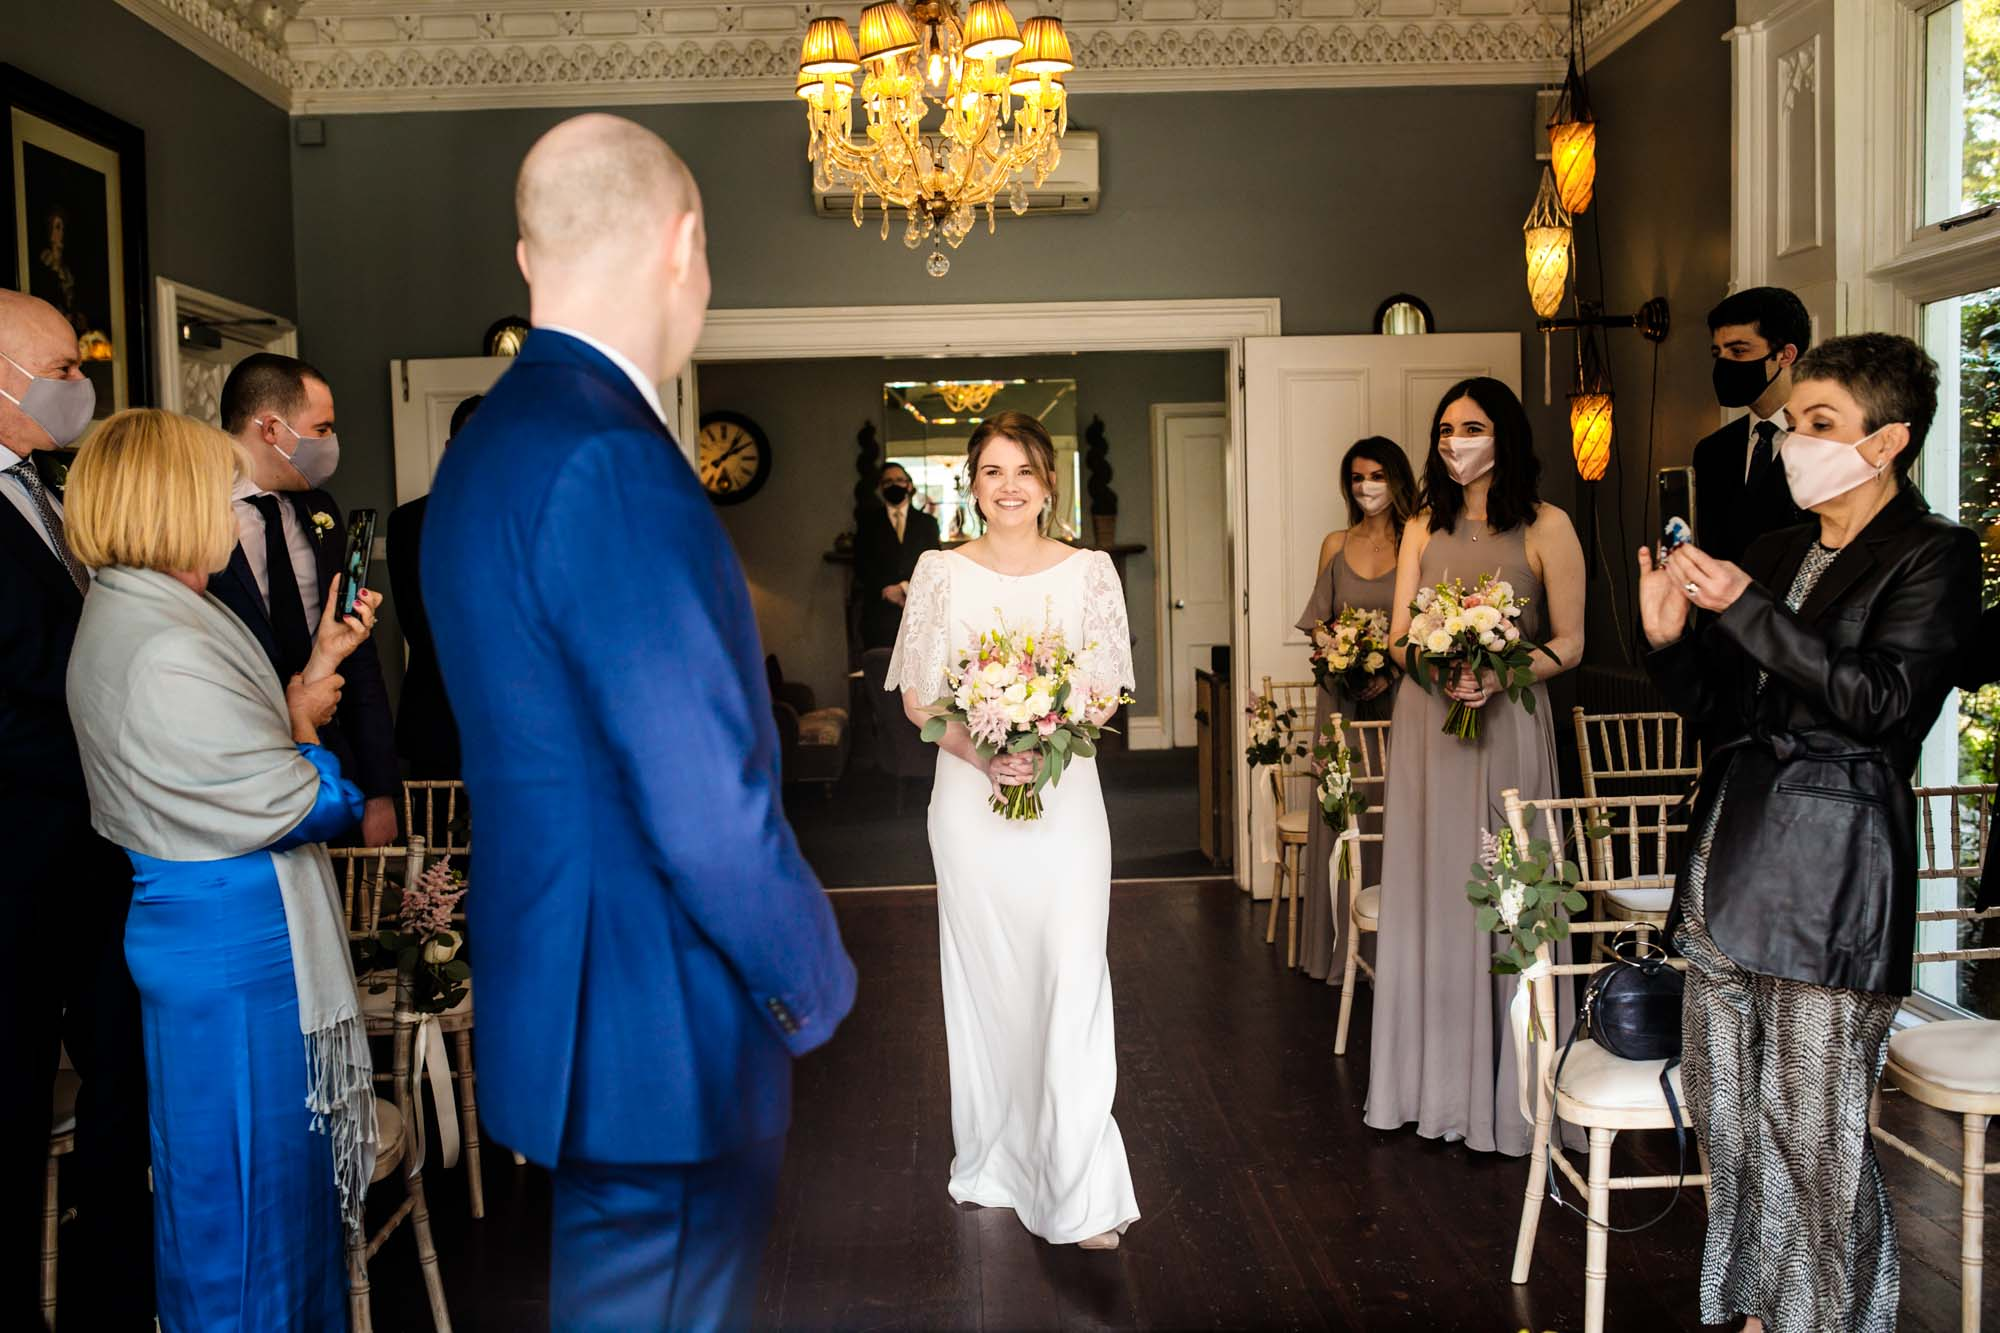 Bride walking down the aisle at Didsbury House Hotel